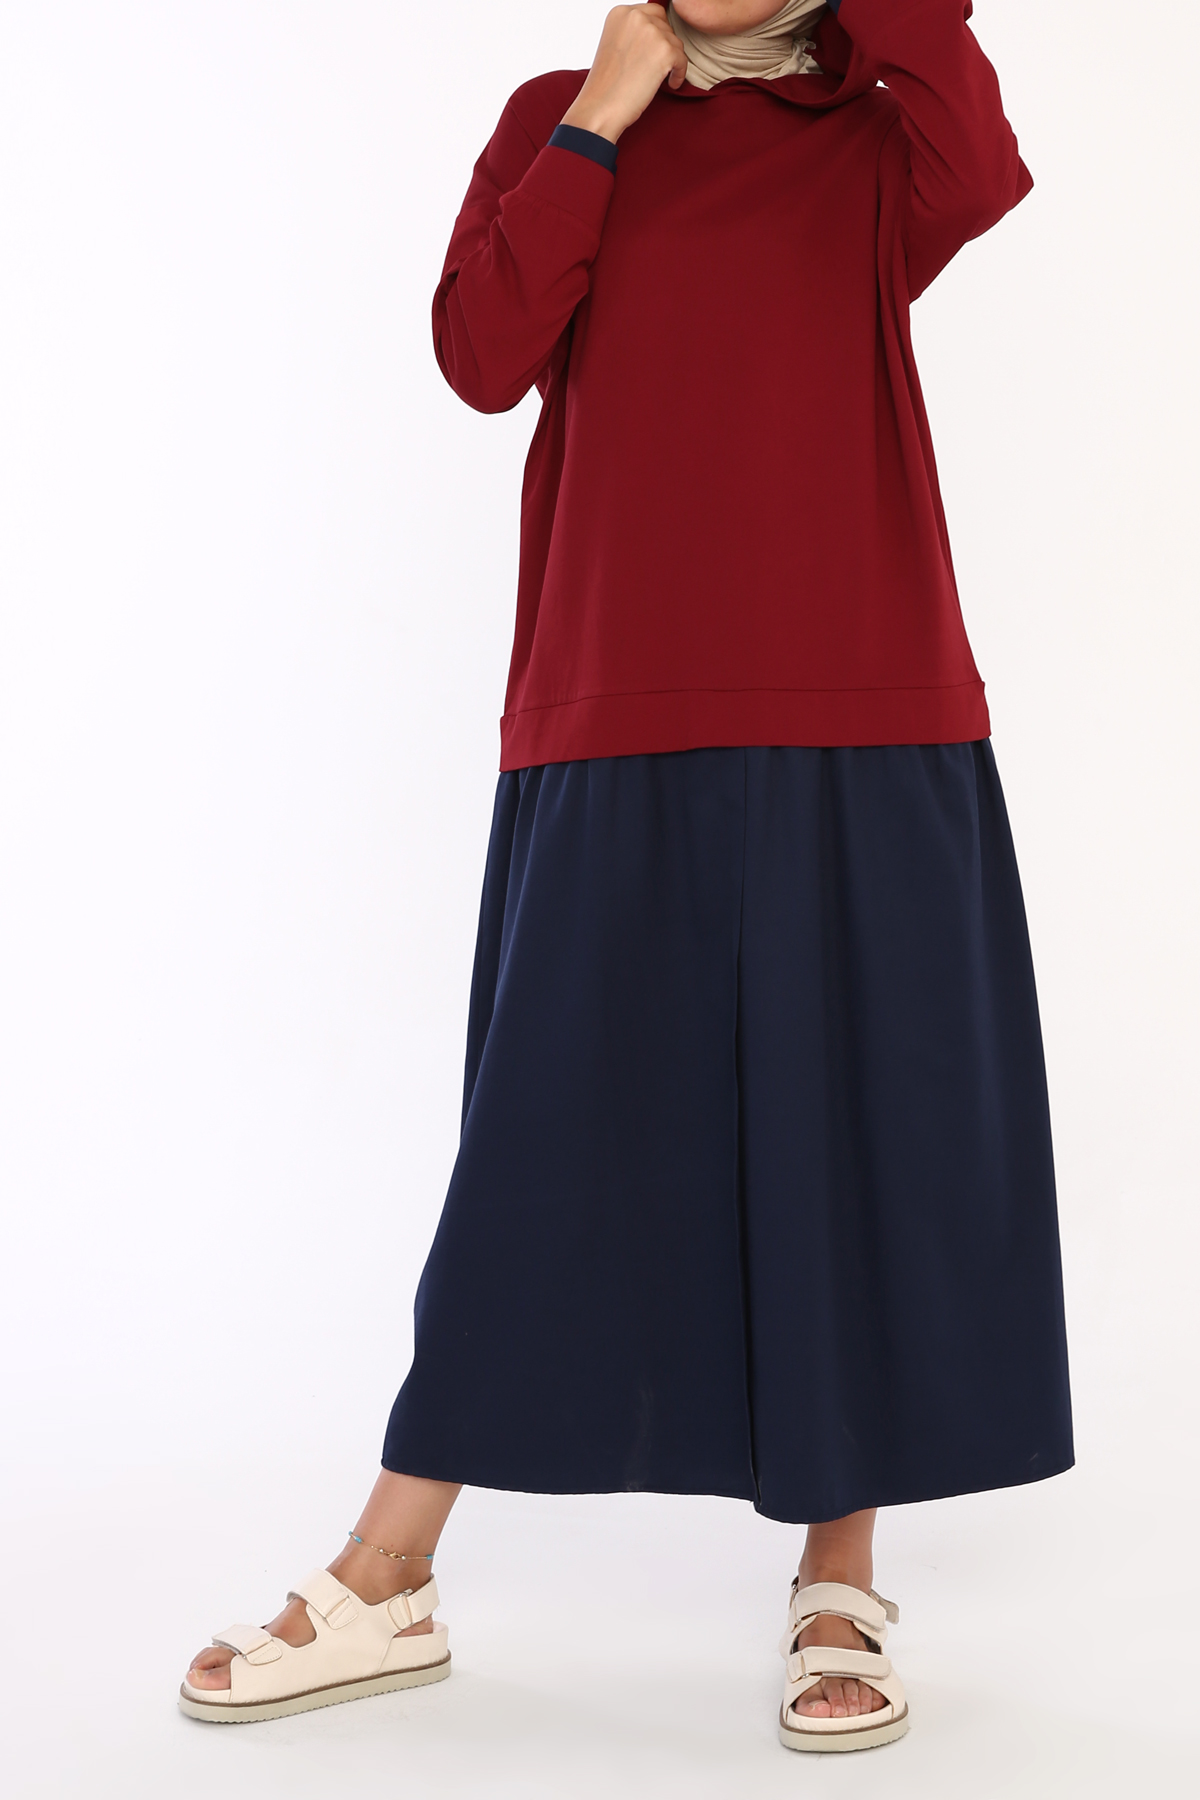 Cotton Hooded Long Dress